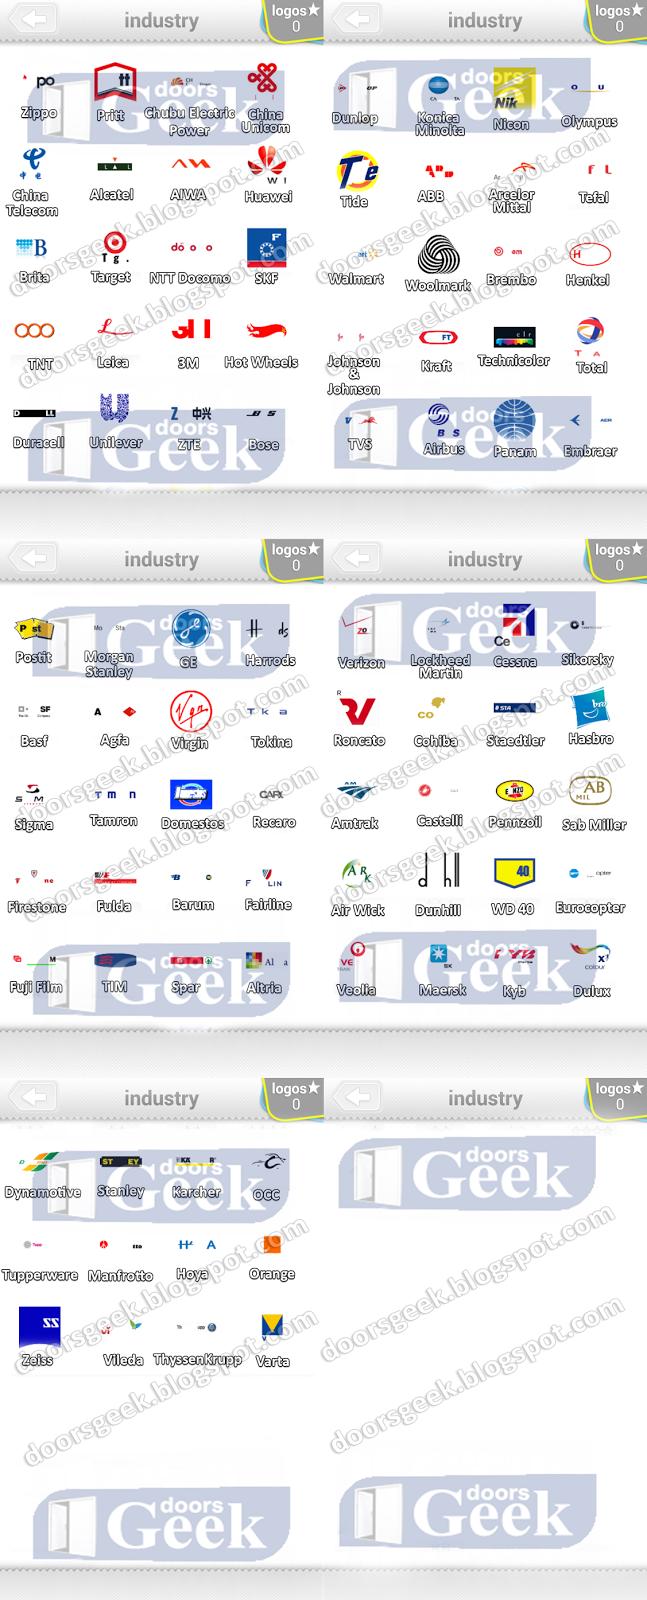 Ultimate Logo Quiz Level 13 - [Industry] ~ Doors Geek  Ultimate Logo Q...